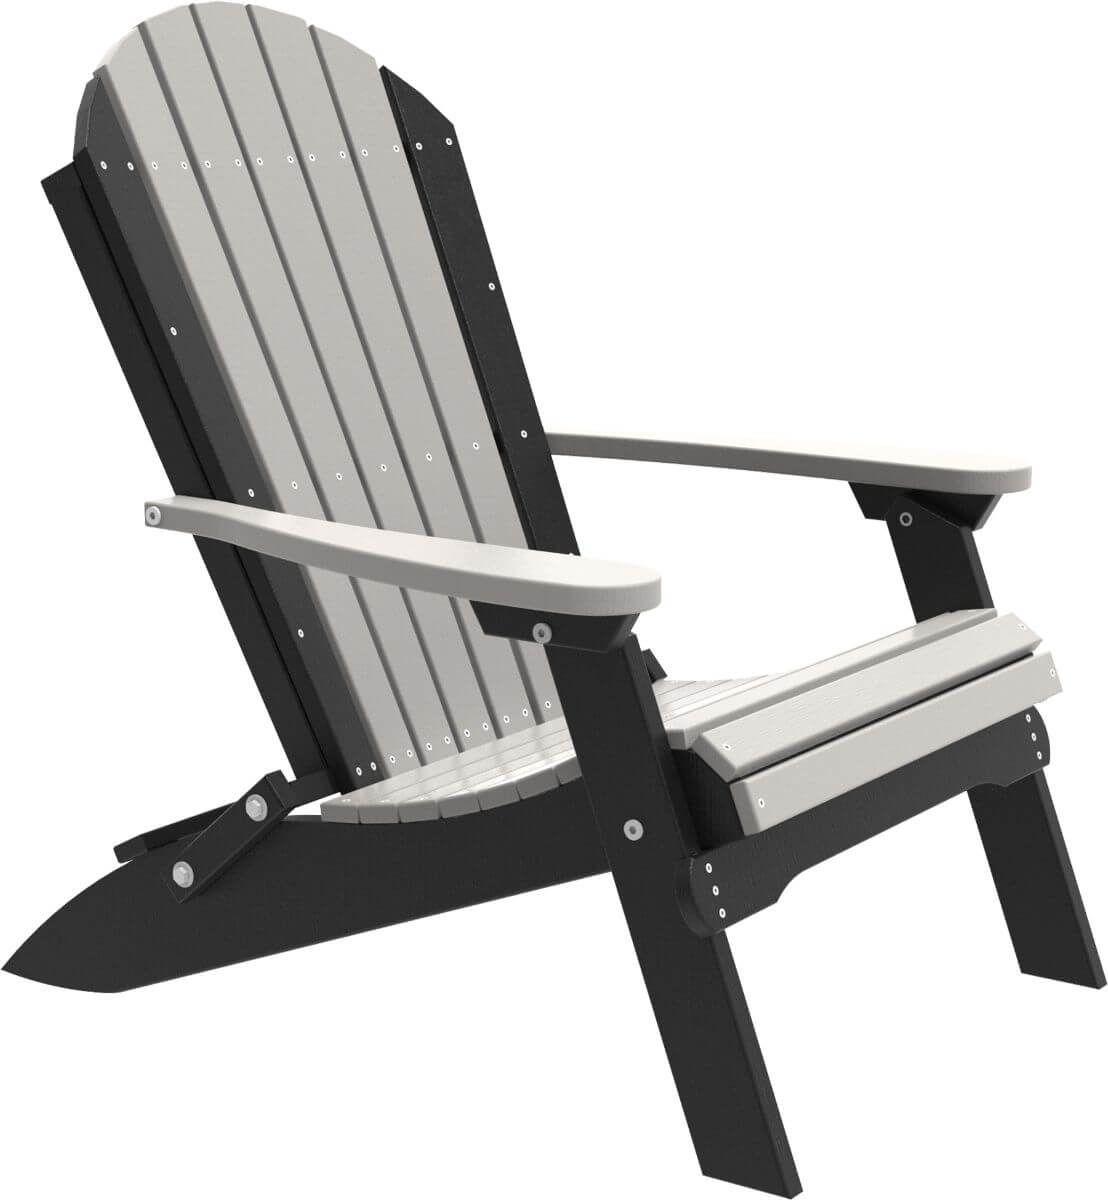 Dove Gray and Black Tahiti Folding Adirondack Chair